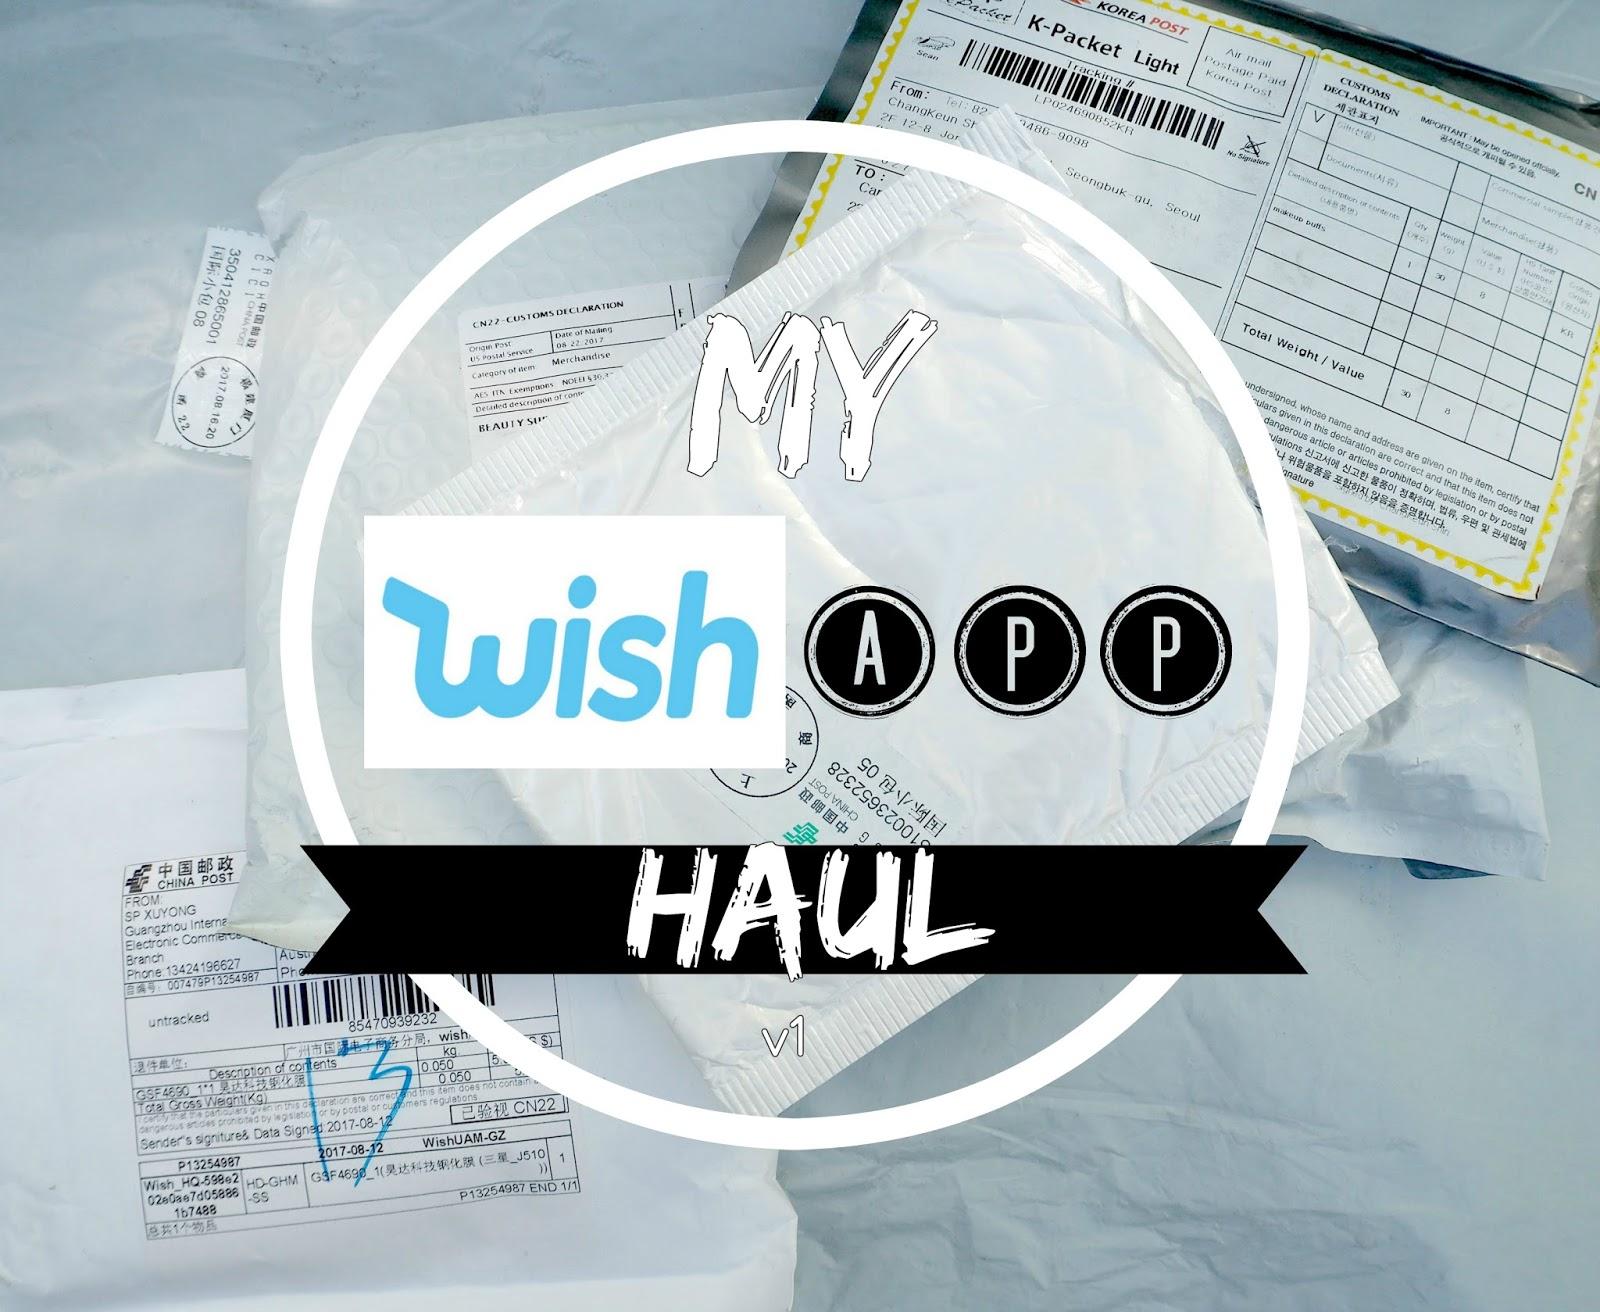 wish app haul v1: www.poshmakeupnstuff.blogspot.com